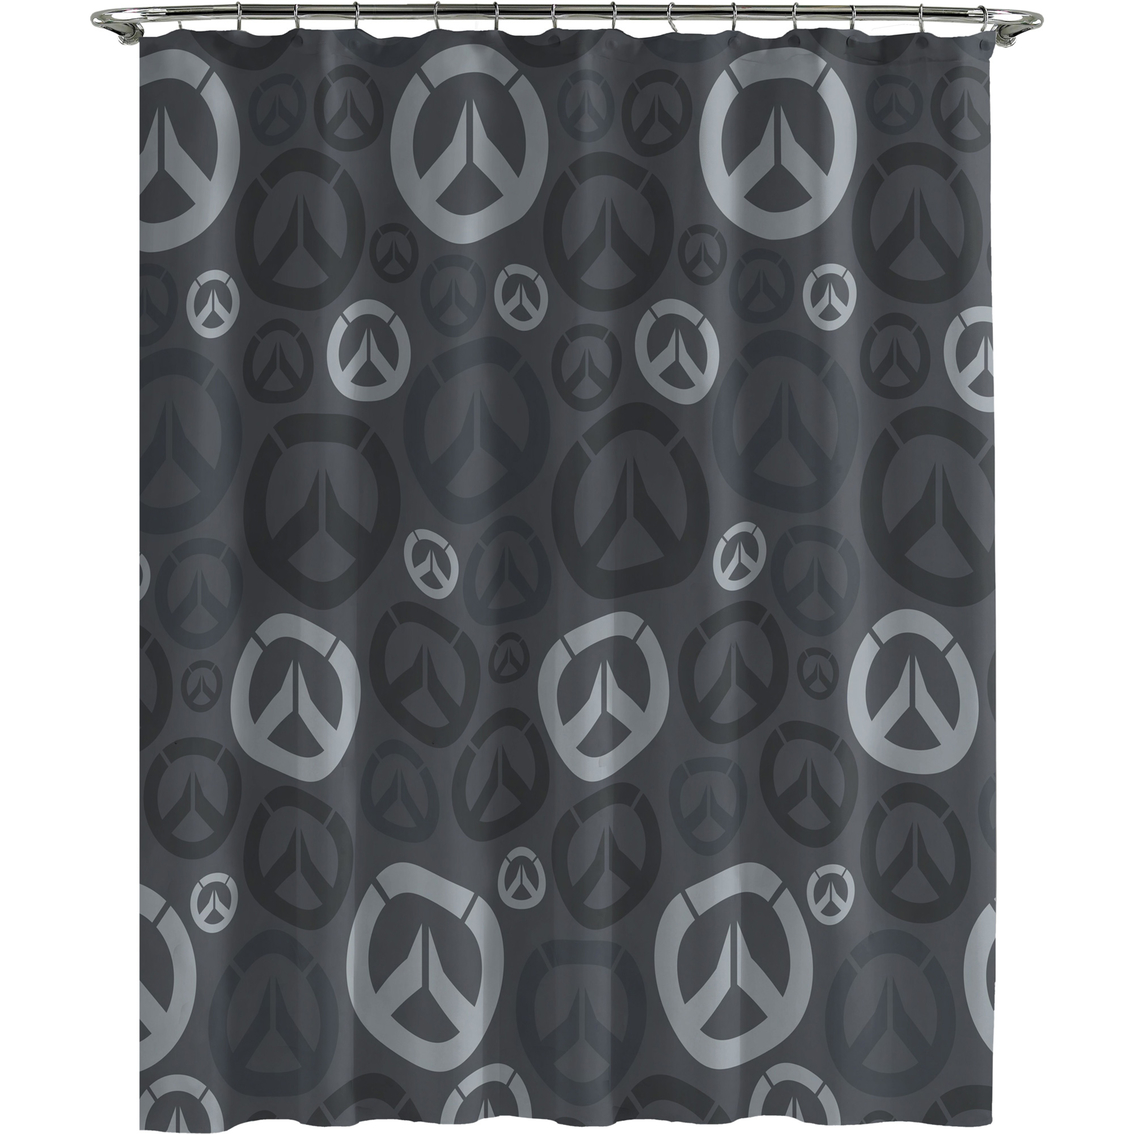 Overwatch Heroes Shower Curtain Hook Set Shower Curtains